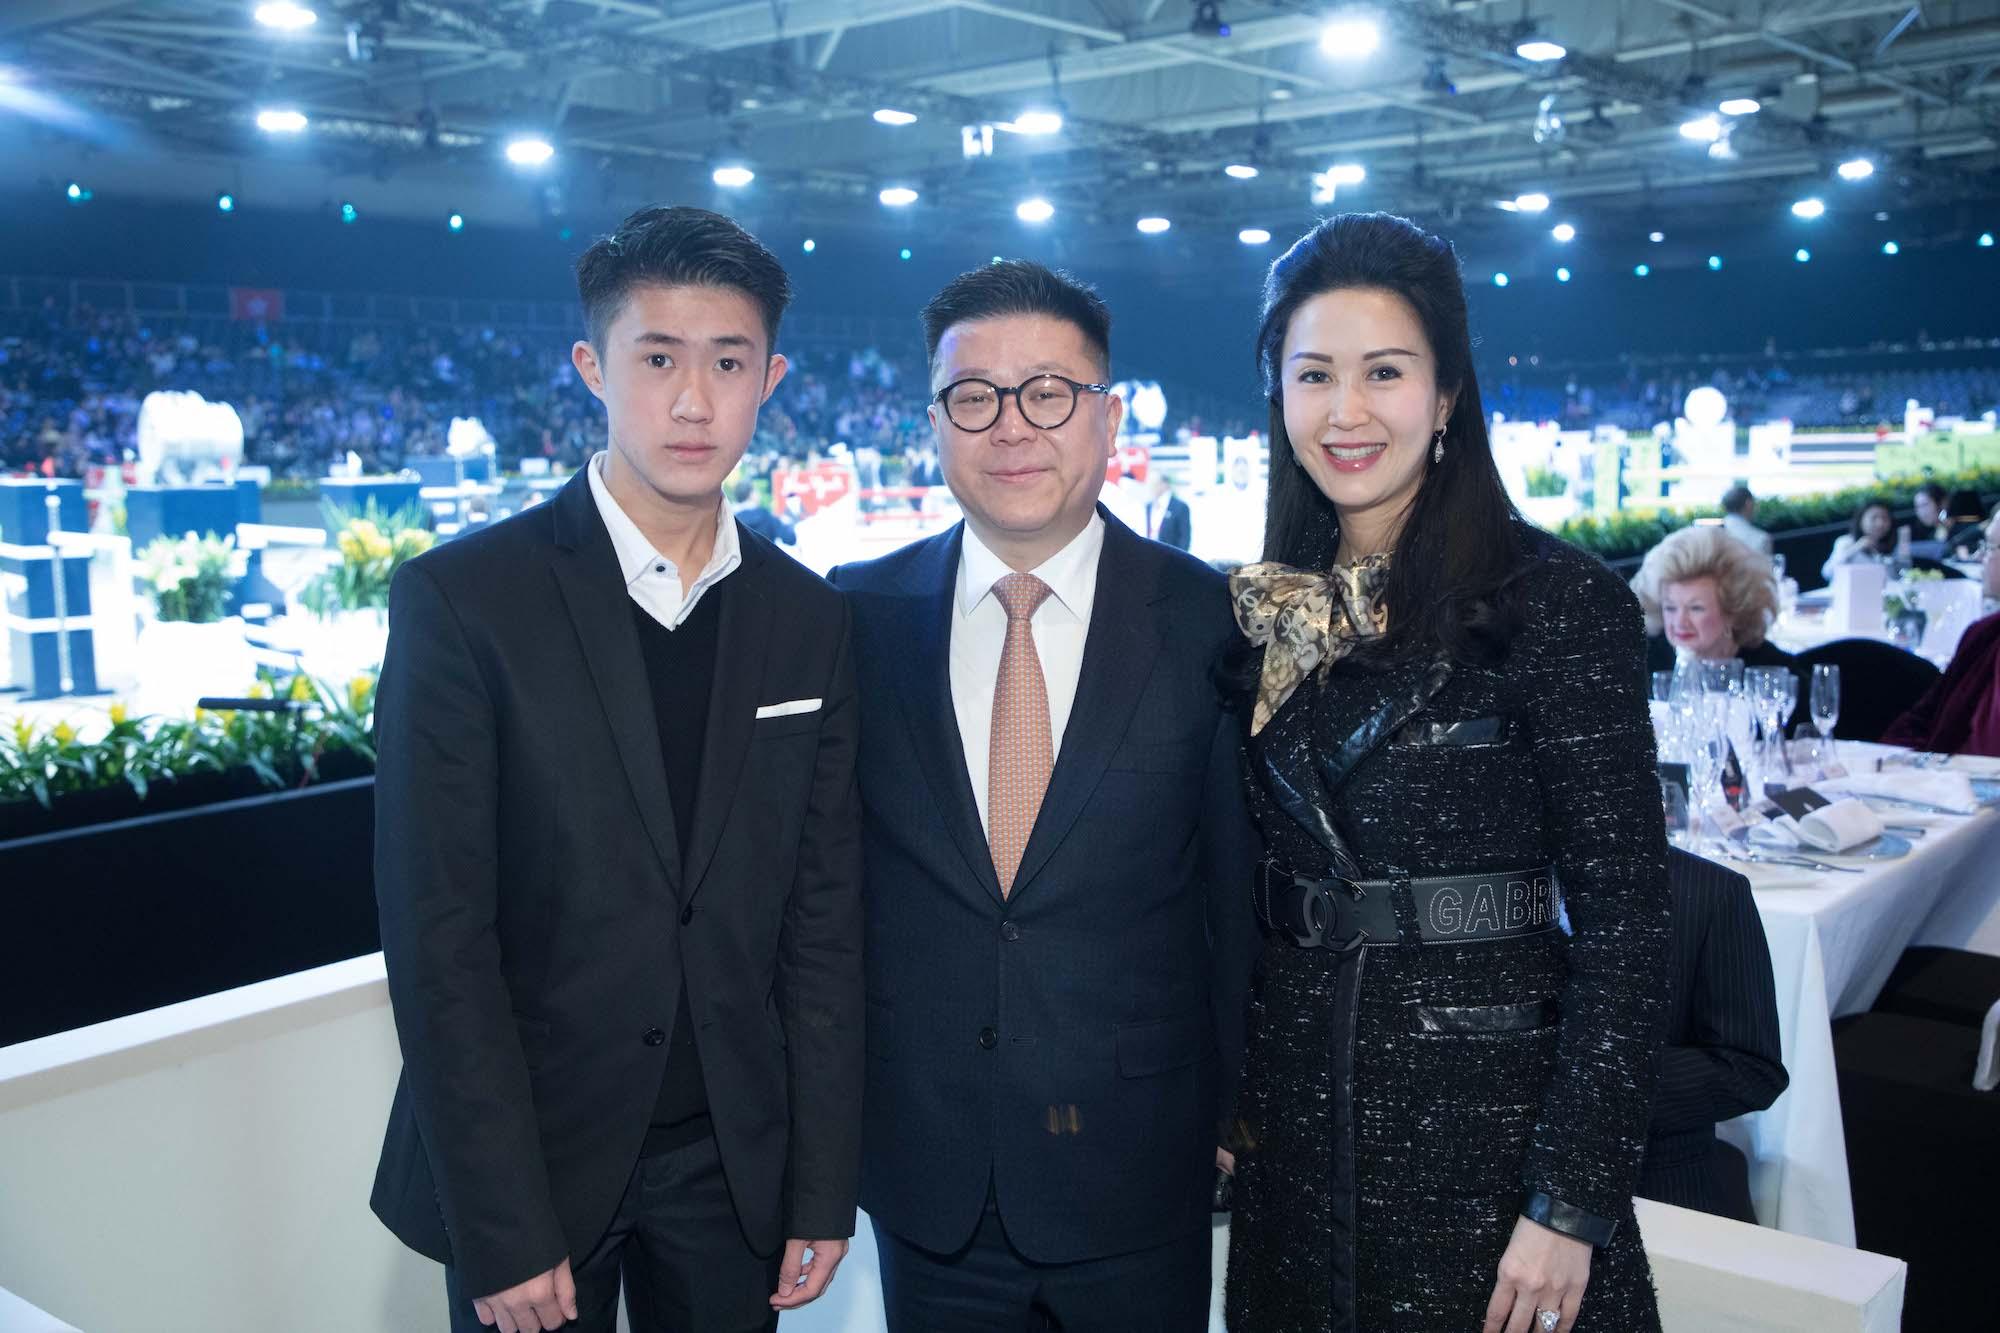 Edward Lam, Matthew Lam, Lianne Lam